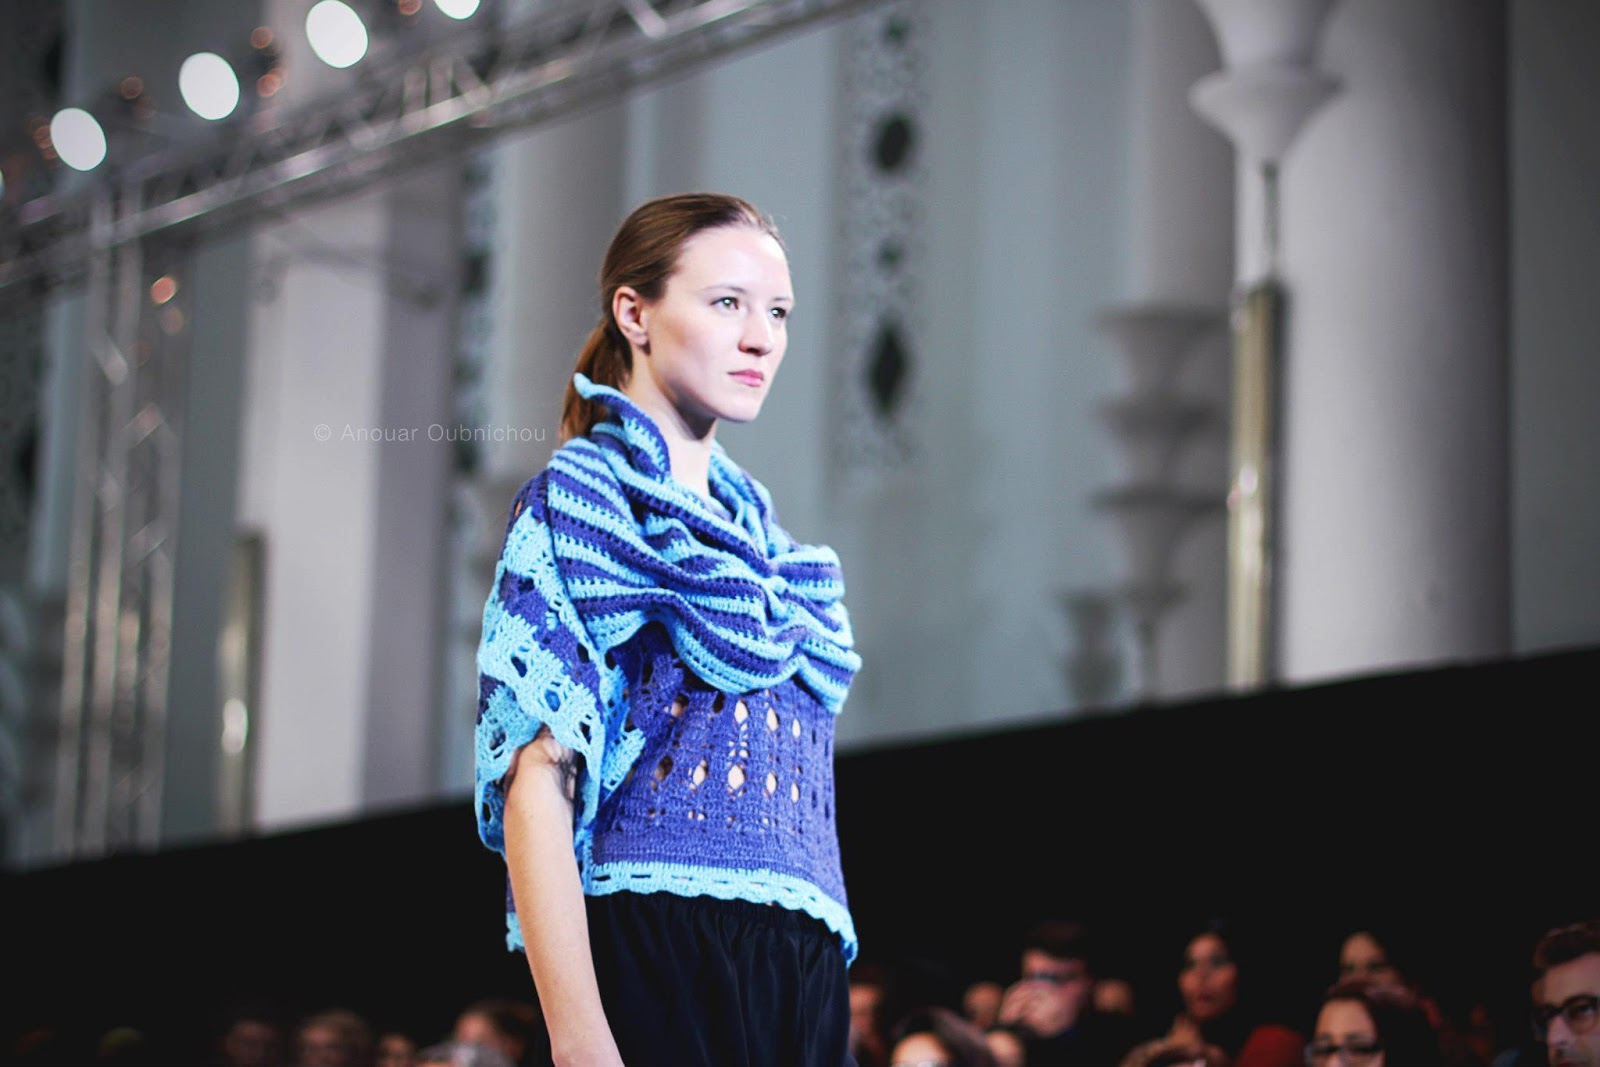 Casablanca: The Romance of Propaganda - Bright Casting fashion week casablanca 2018